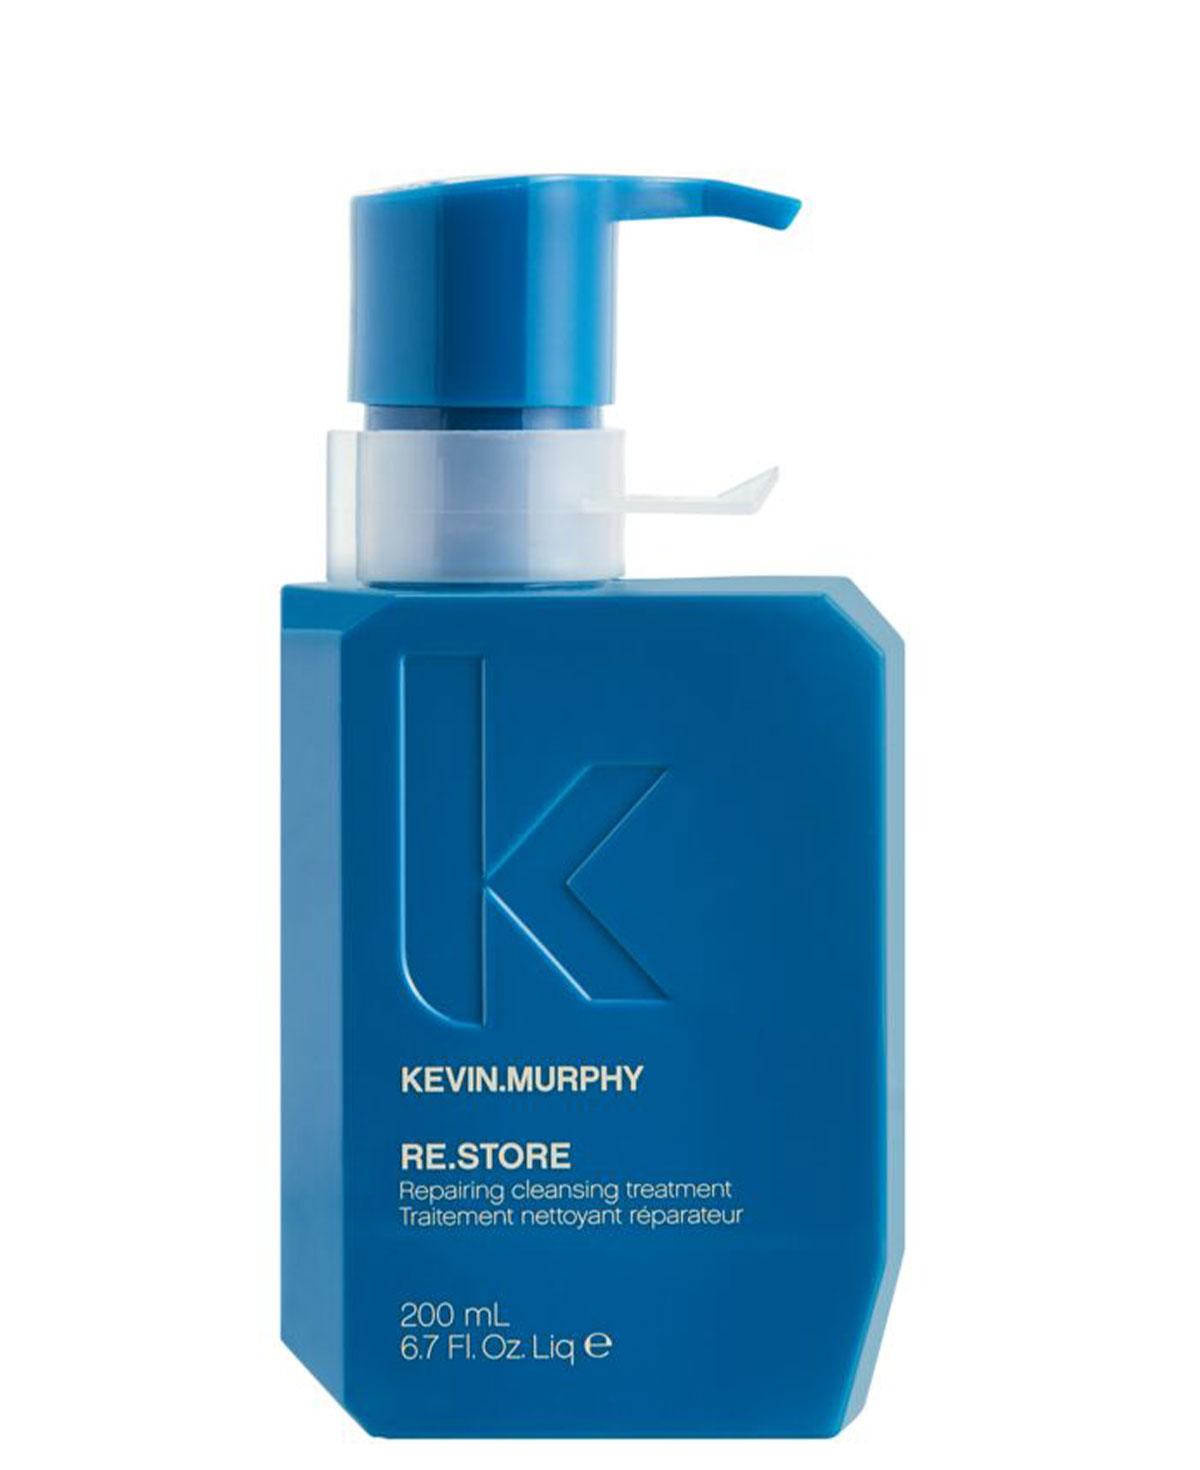 Kevin.Murphy RE.STORE 200ml